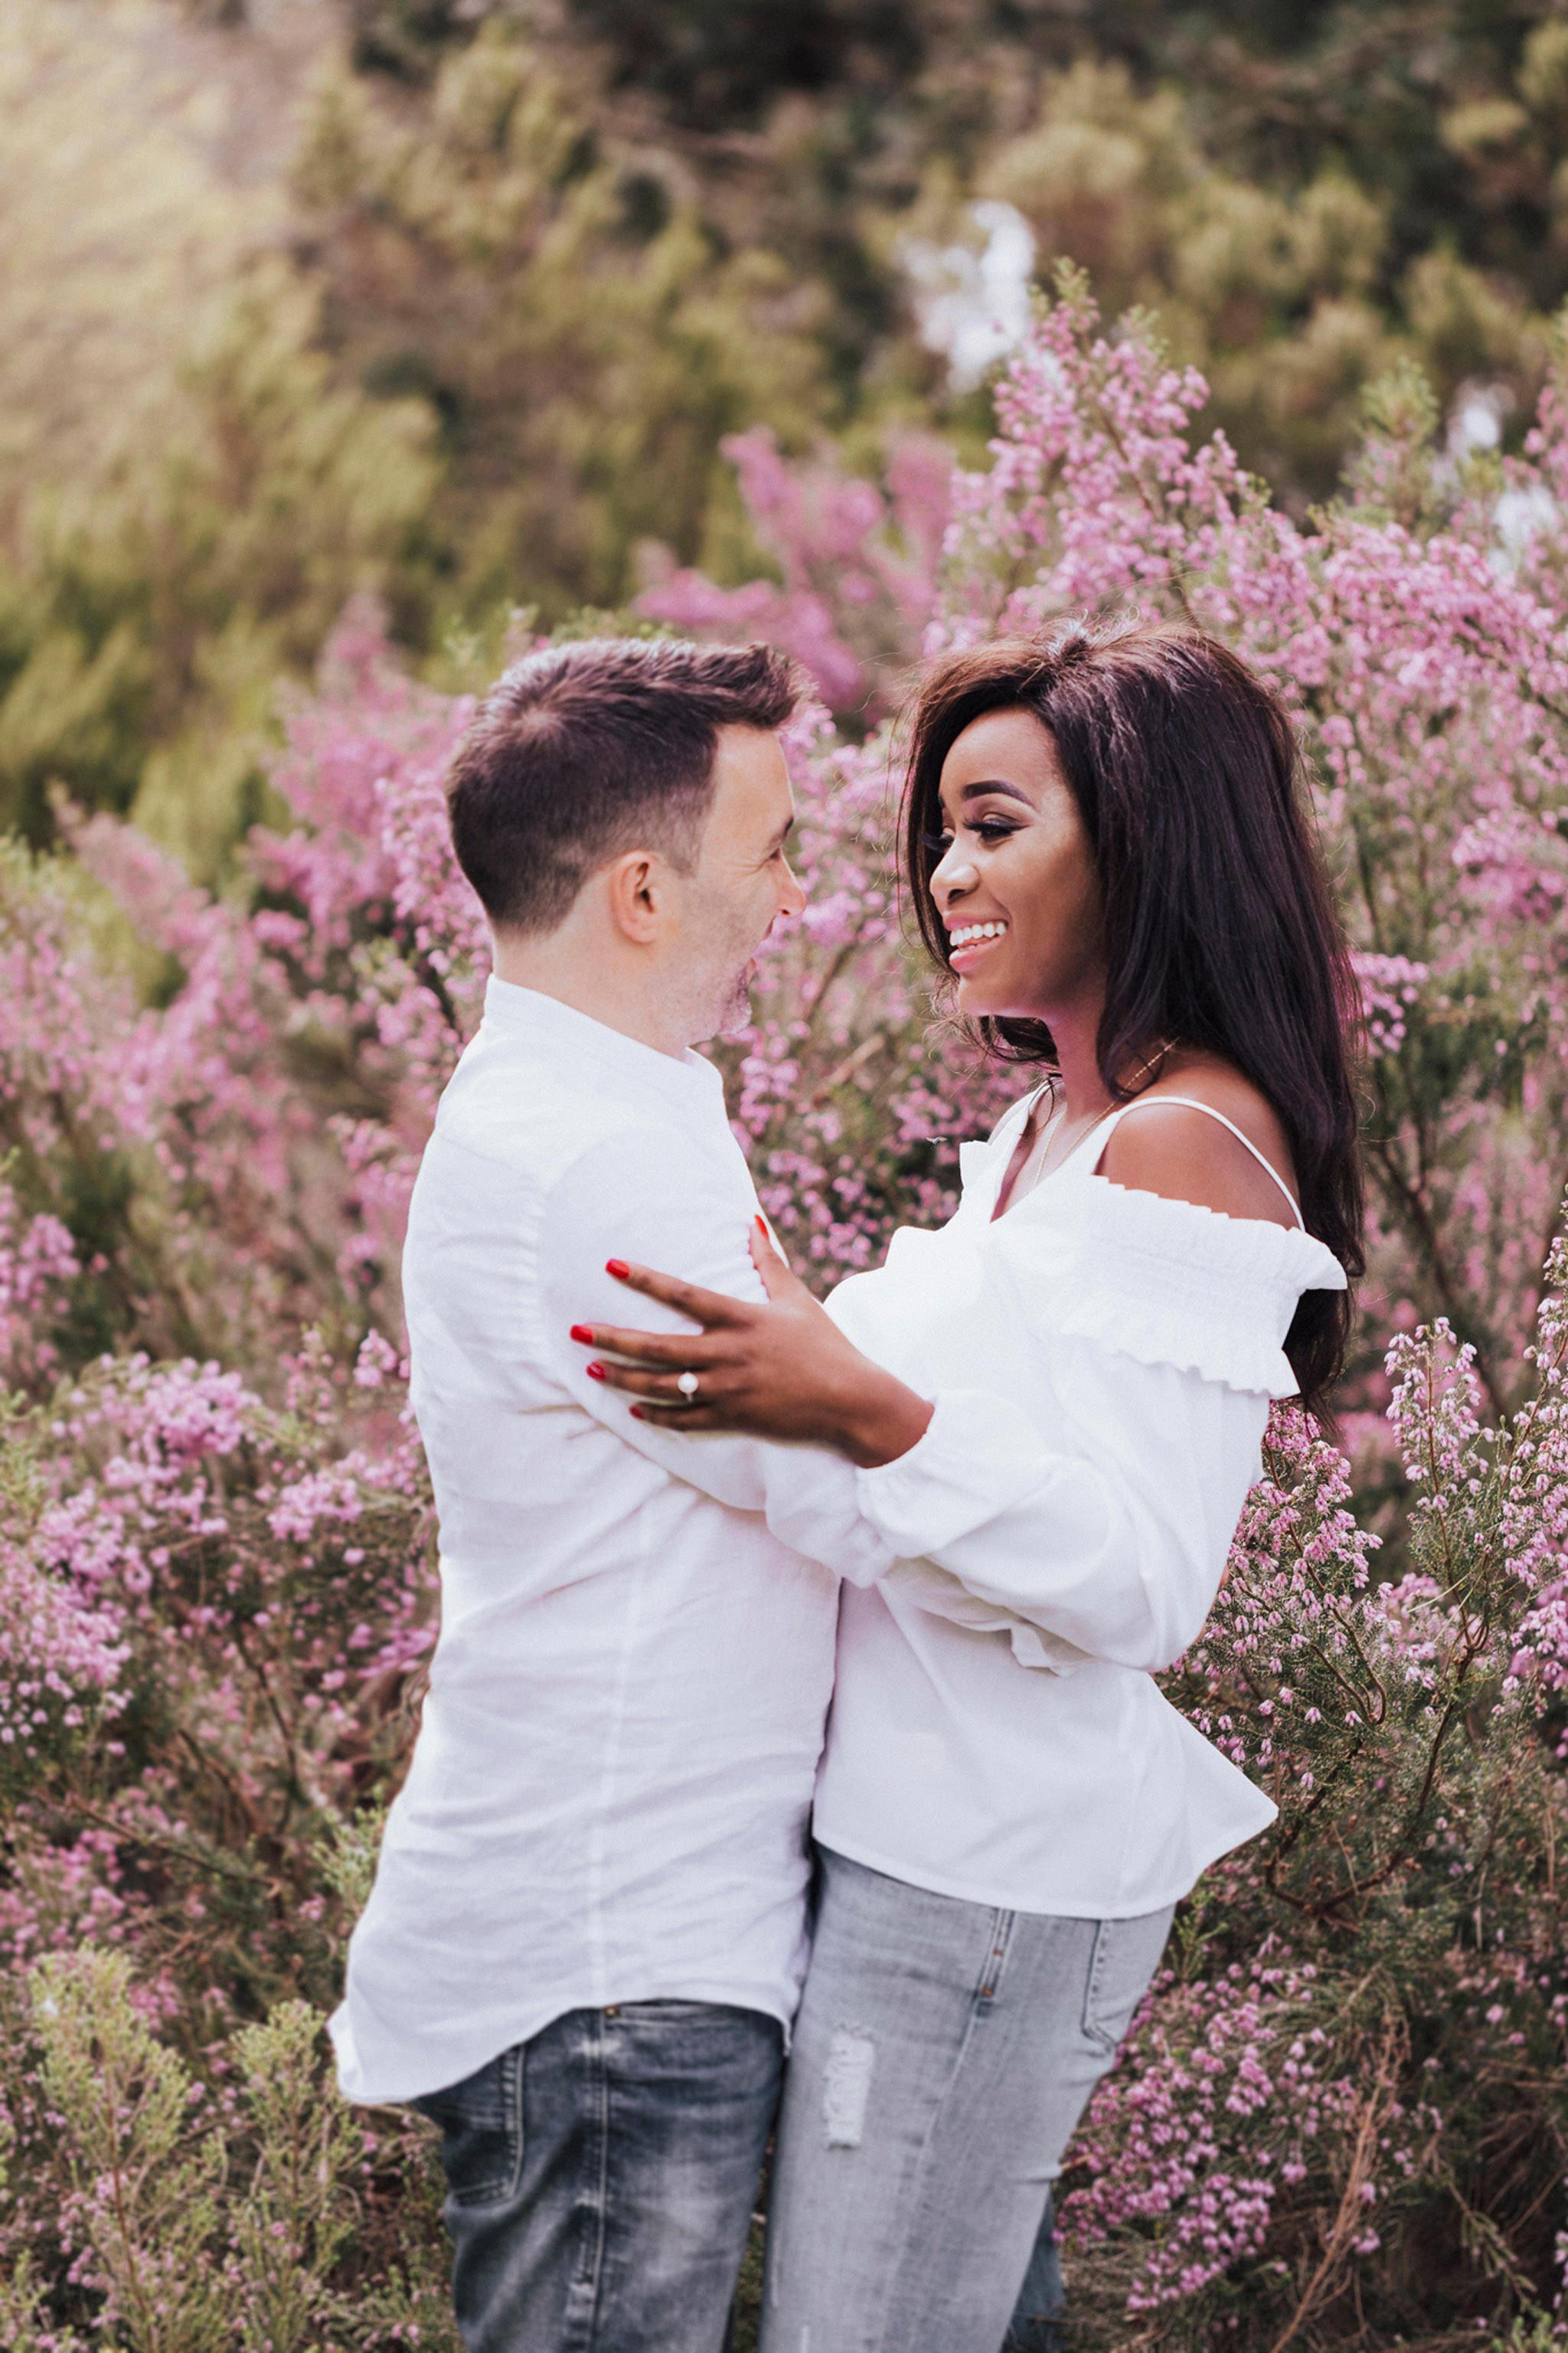 dundee-engagement-wedding-photographer-10.jpg